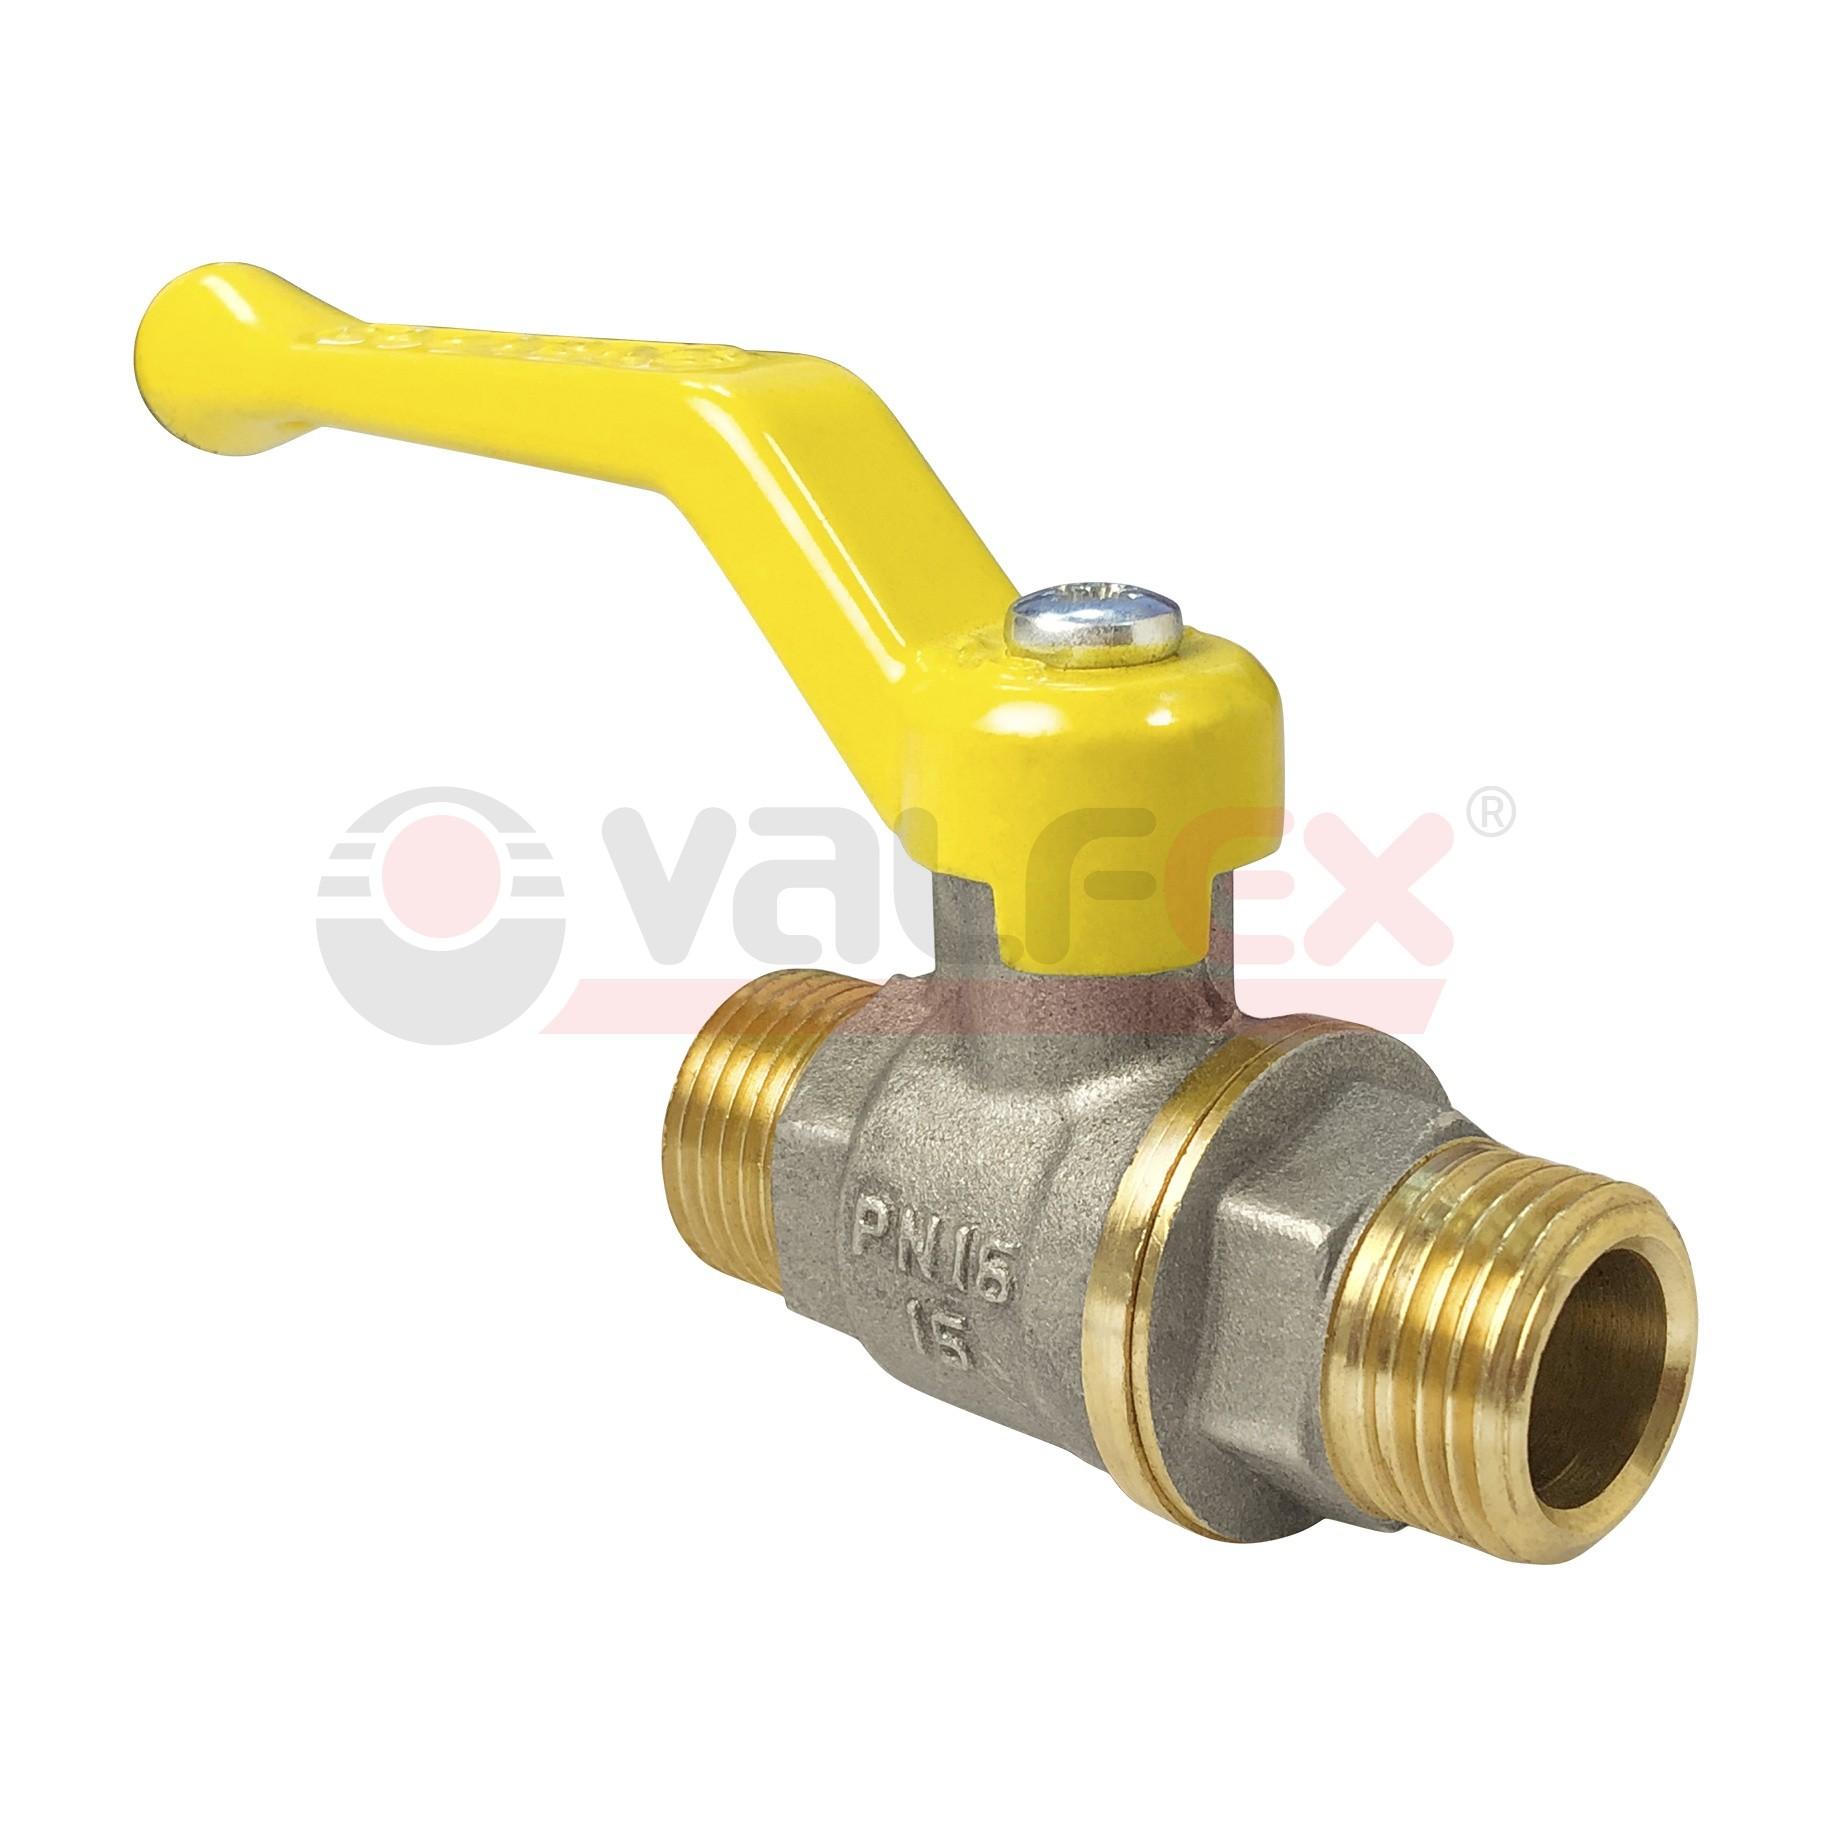 Кран шаровой для газа полнопроходной VALFEX ручка рычаг резьба наружная-наружная